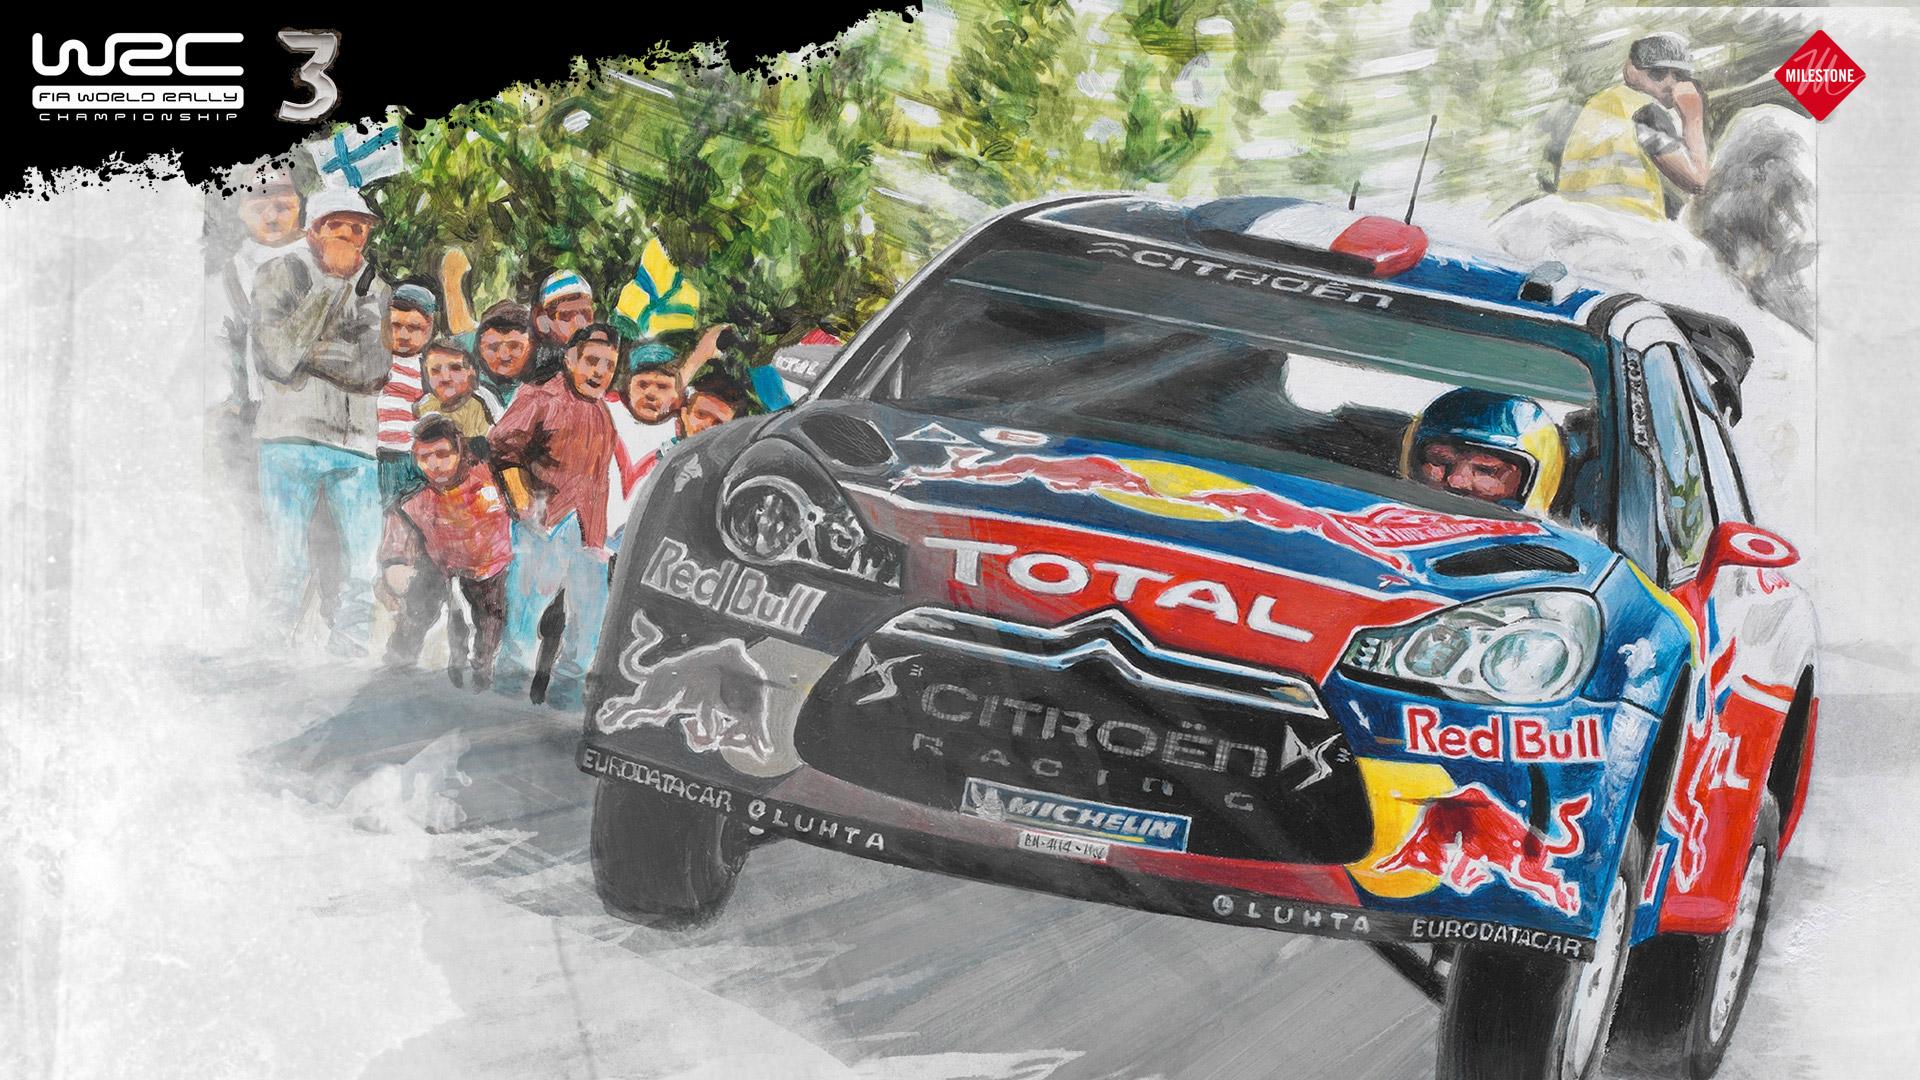 Free WRC 3: FIA World Rally Championship Wallpaper in 1920x1080